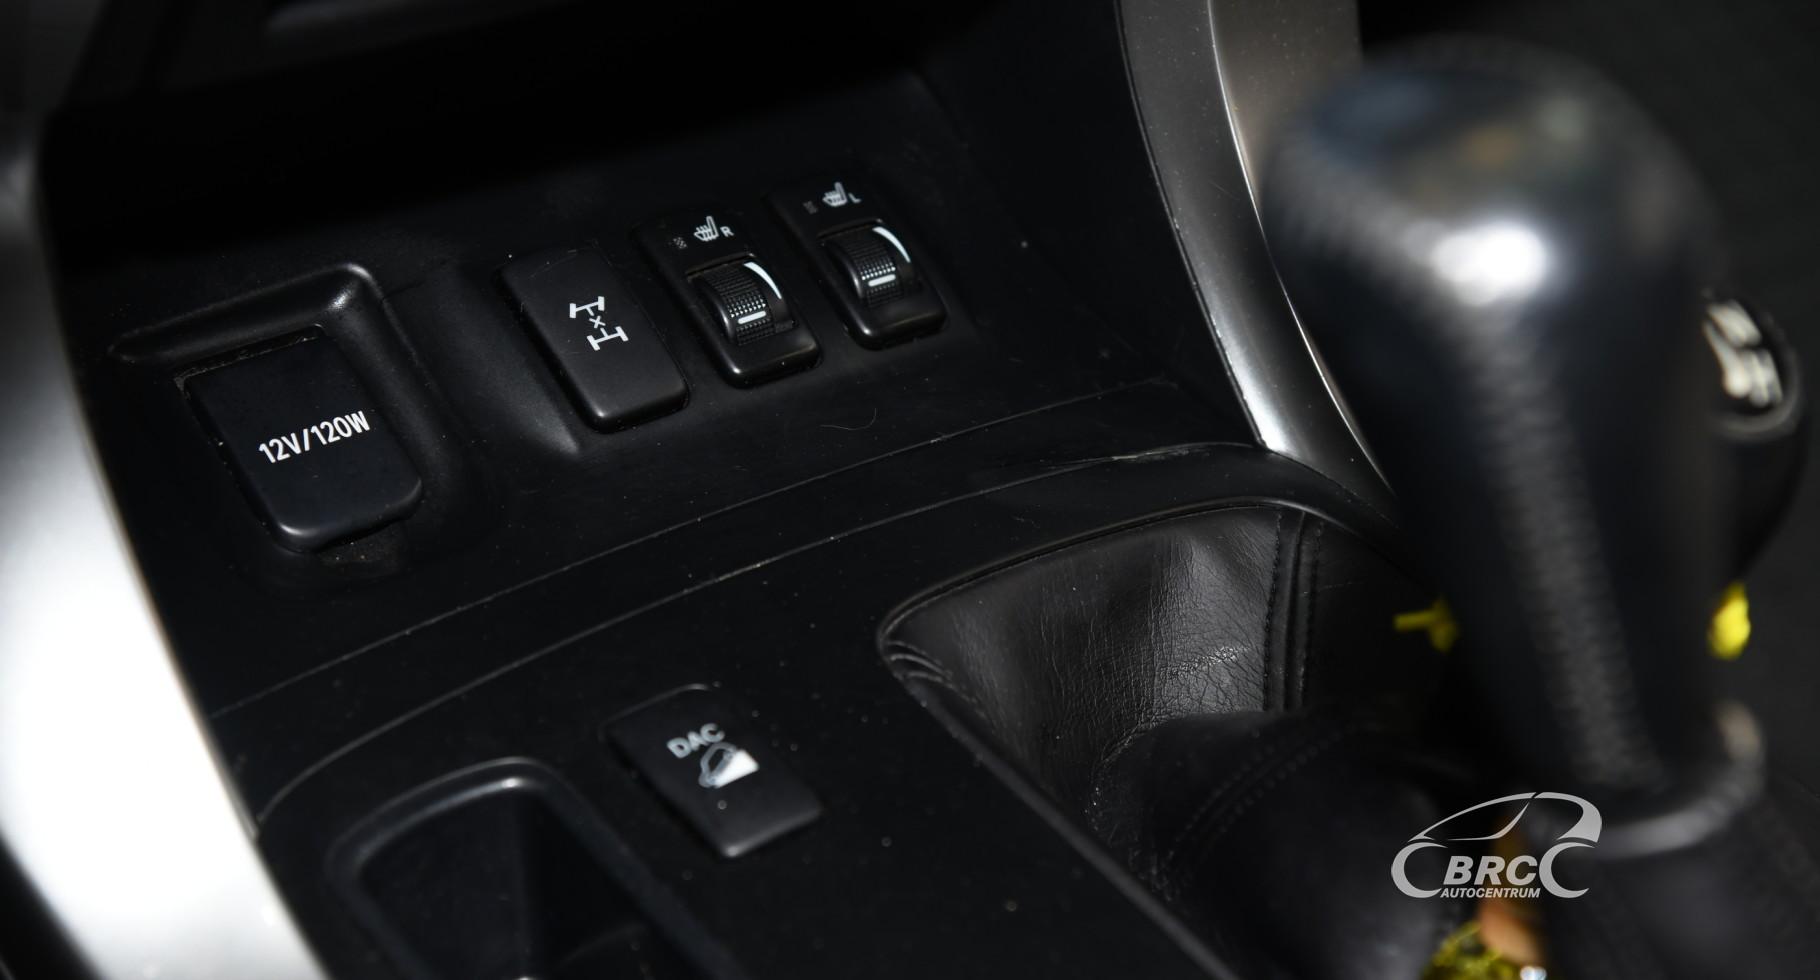 Toyota Land Cruiser 3.0 D-4D 120 - series Automatas